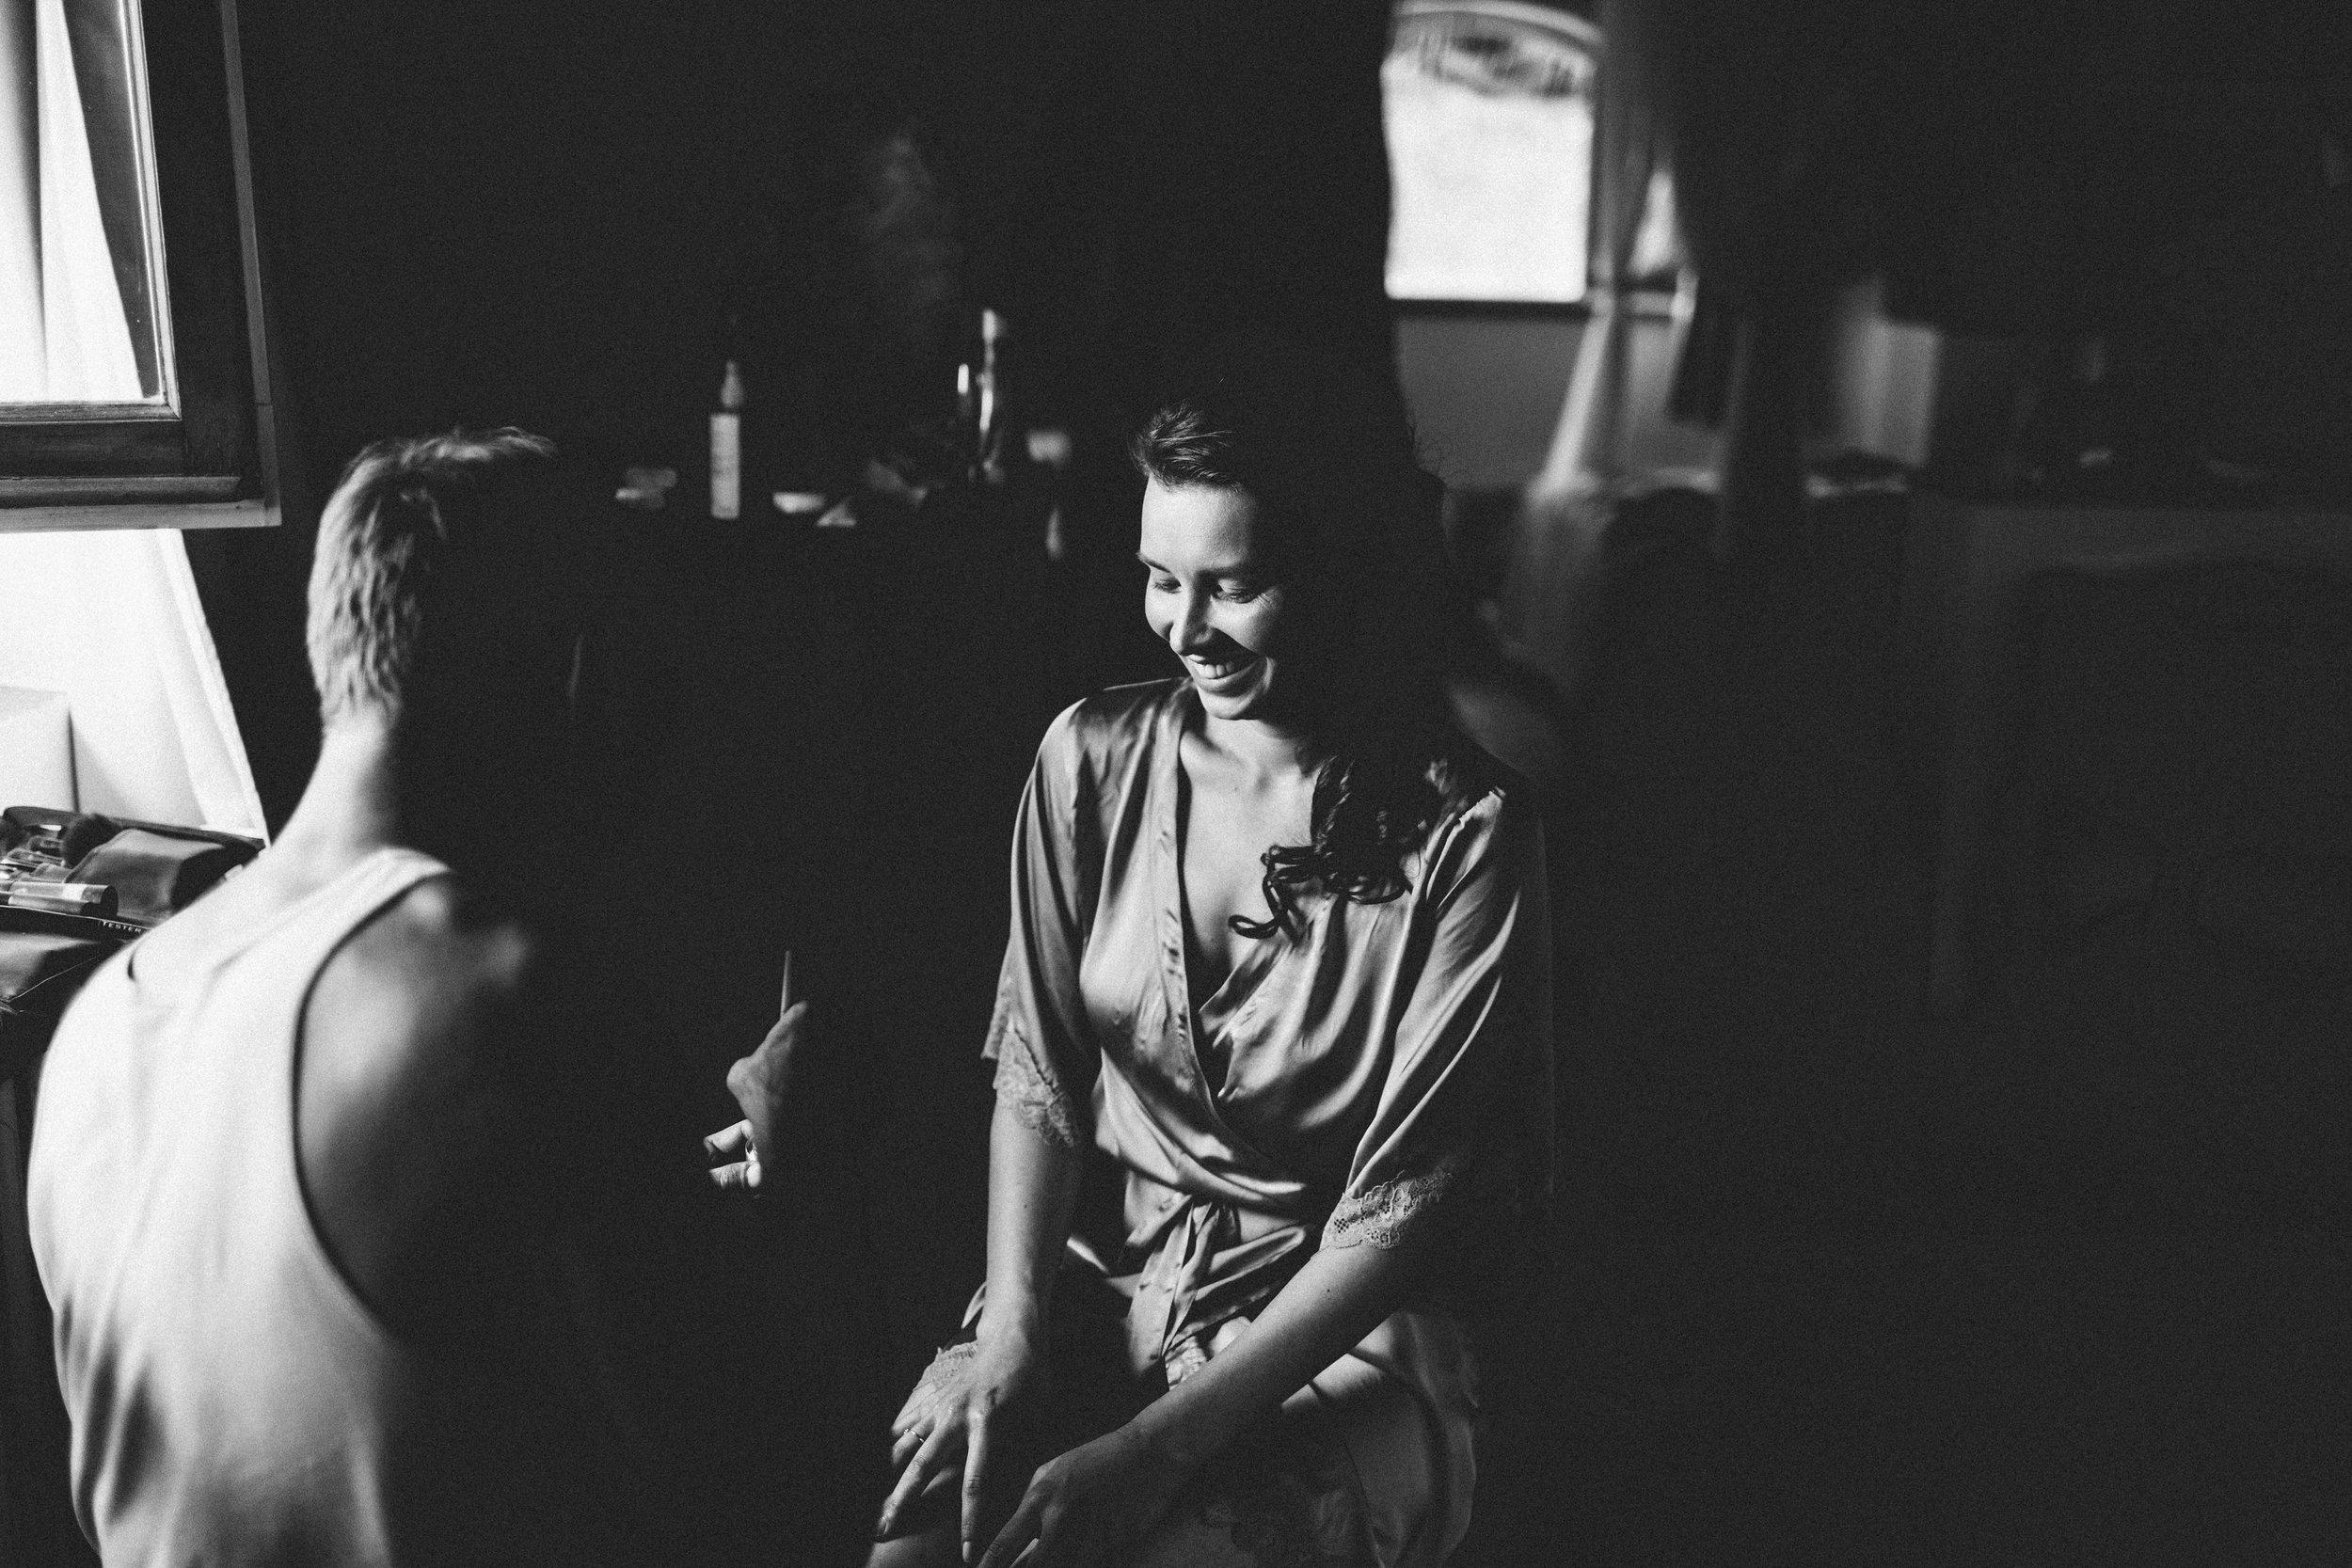 Amanda-Drost-Photography-wedding-Arjan+Emmy-zw-50.jpg